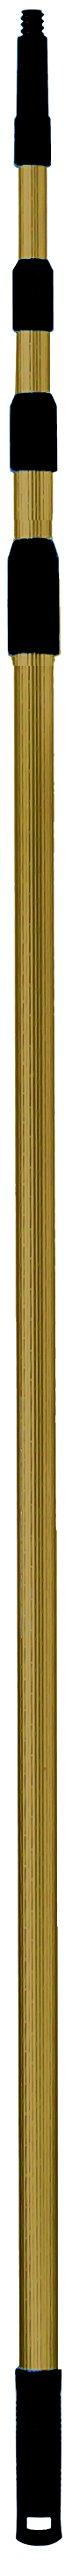 Ettore 44118 InterPro 4-Section Interlock Extension Pole, 18' (Pack of 6)